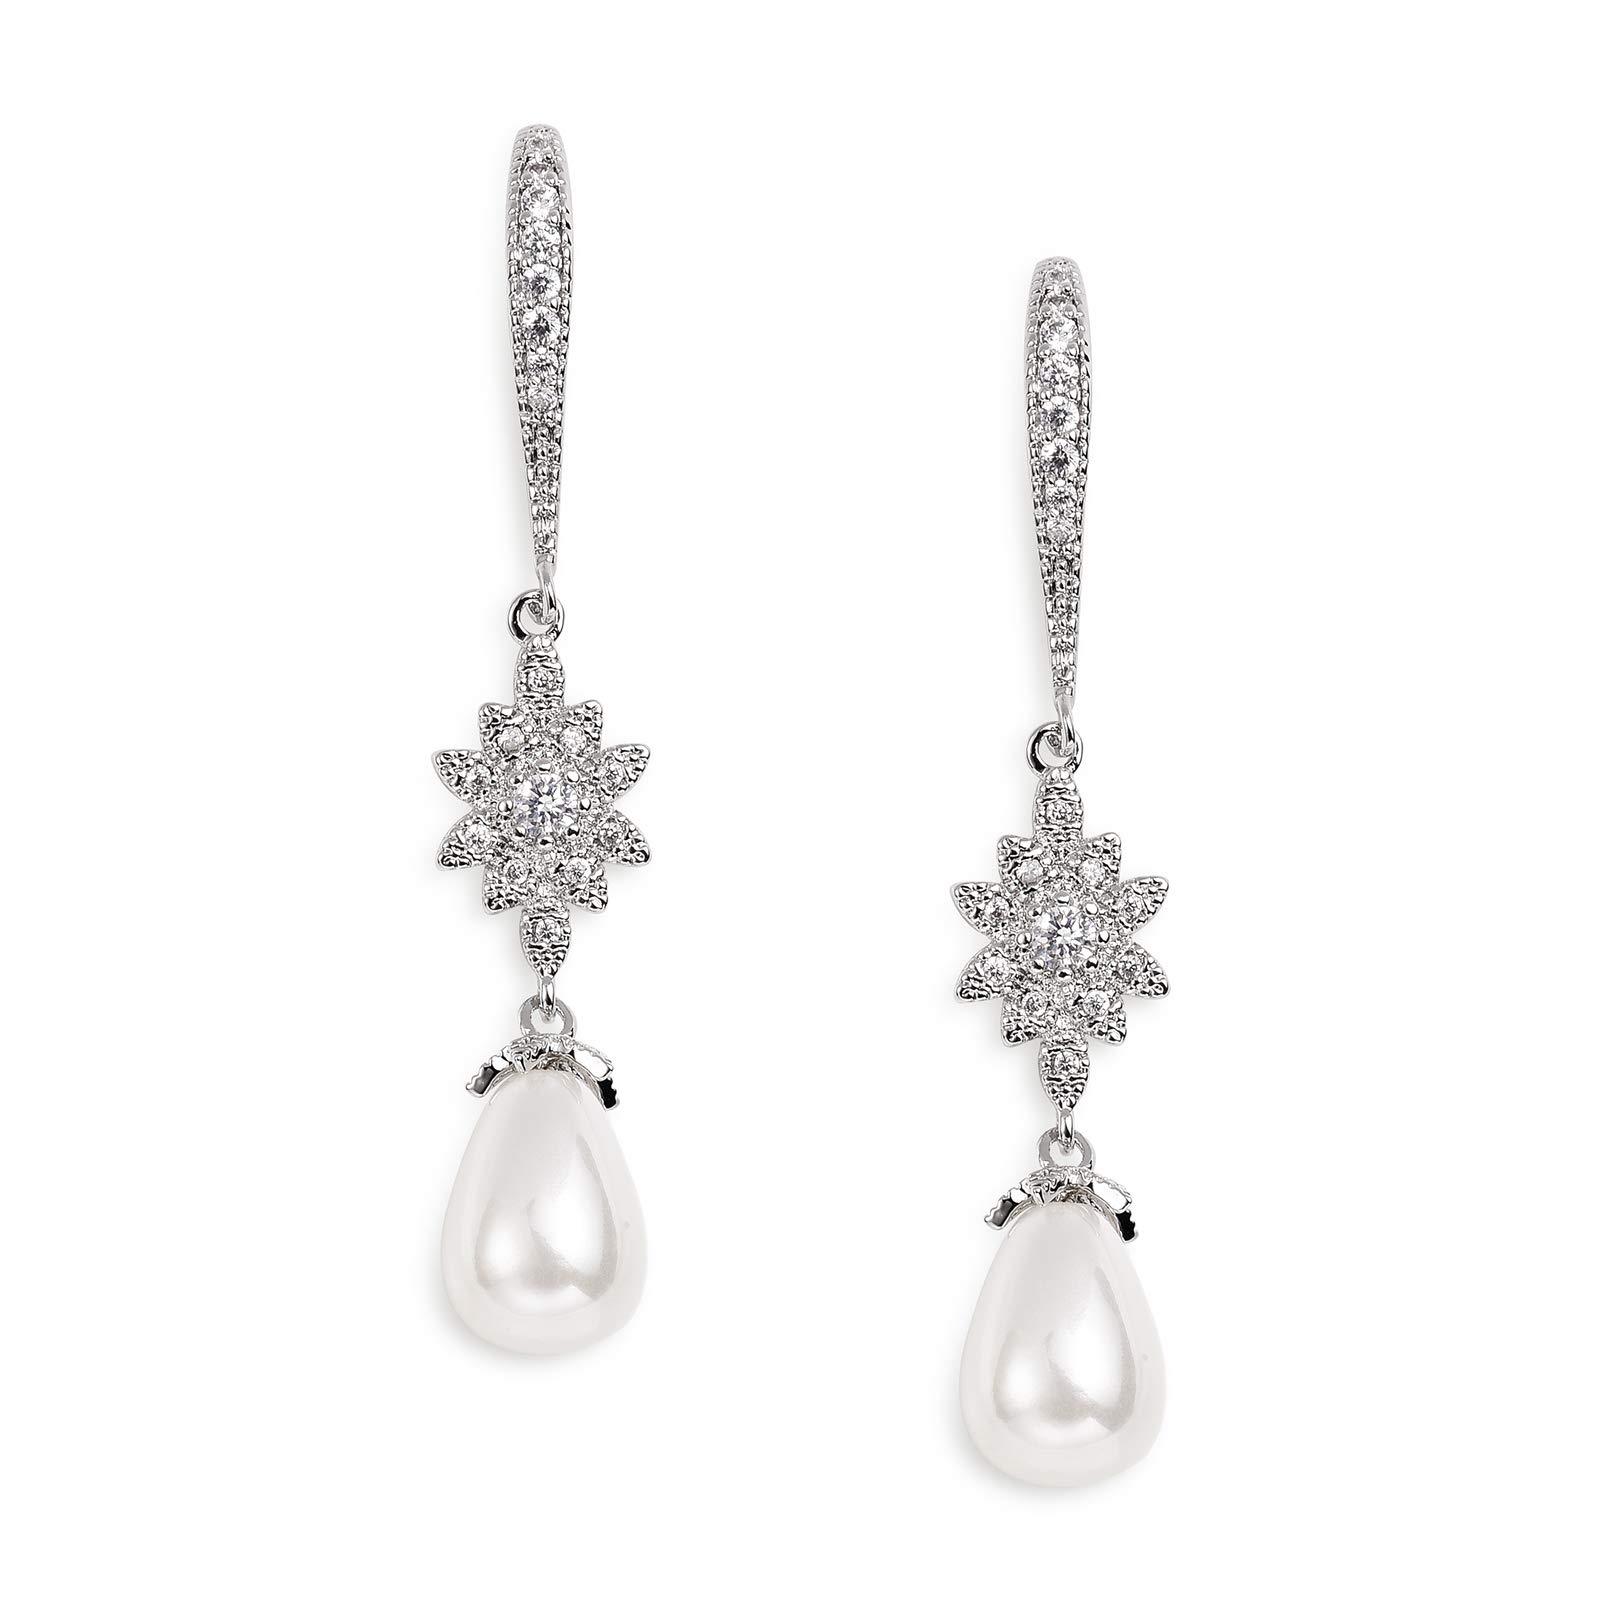 SWEETV Pearl Drop Earrings for Wedding Bridal -Teardrop Cubic Zirconia Dangle Earrings for Women,Bridesmaids,Brides